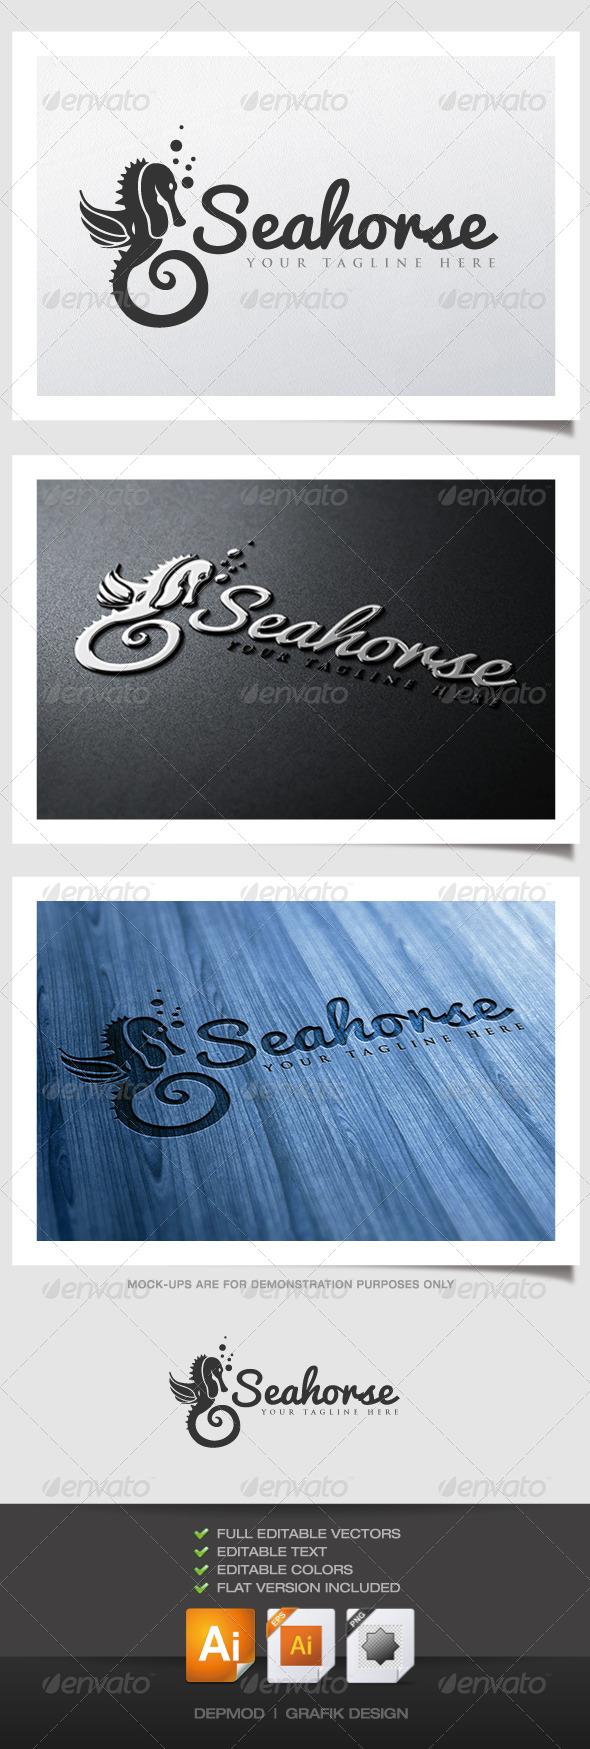 GraphicRiver Seahorse Logo 4539777